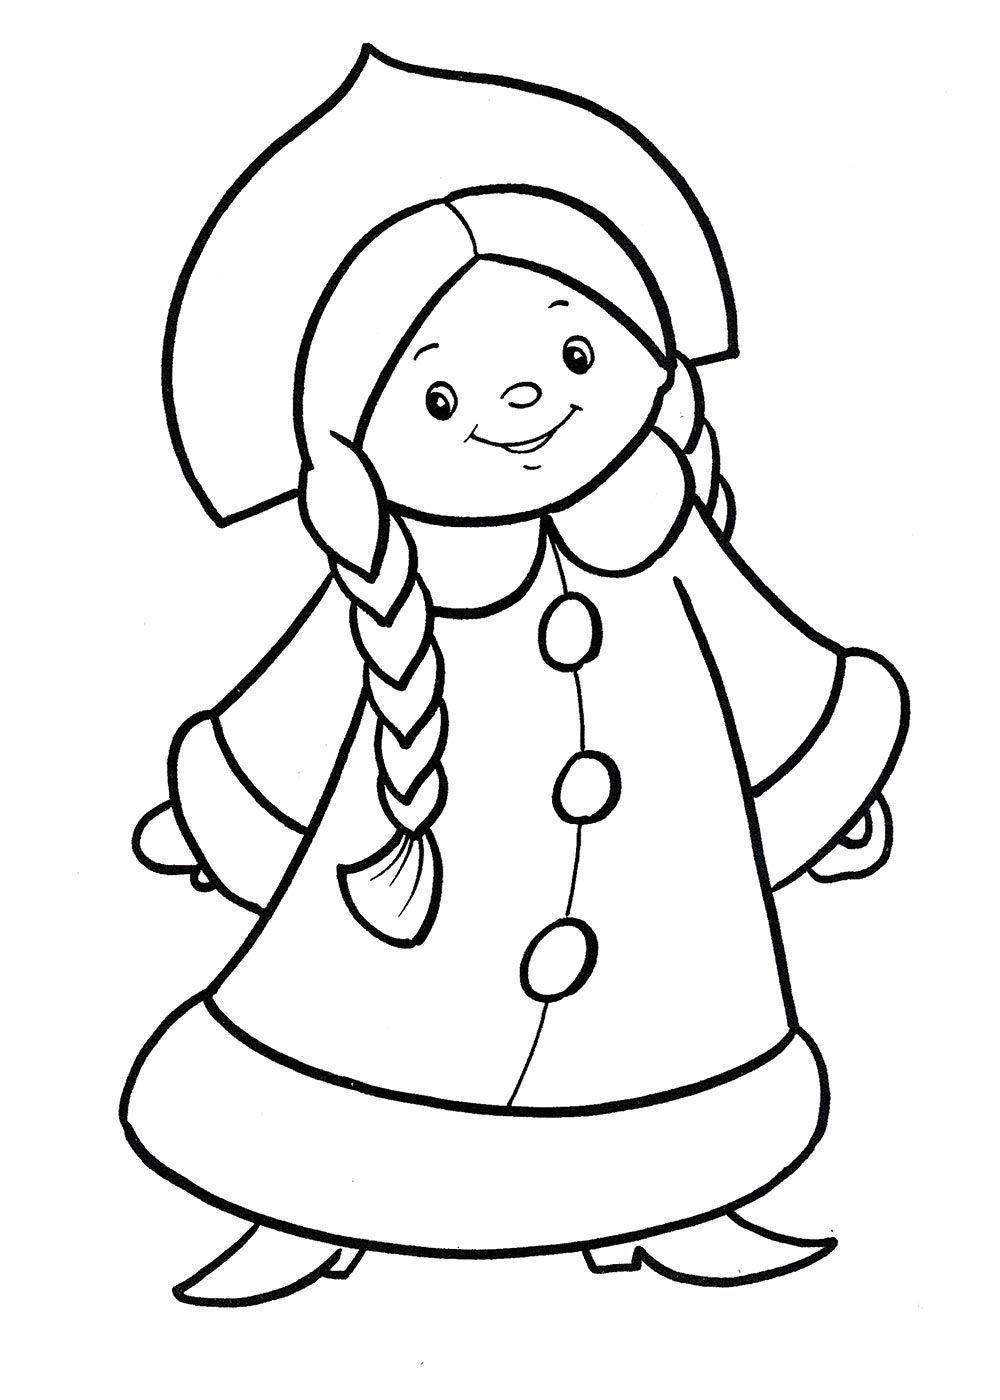 Снегурочка Раскраска сказочная зима